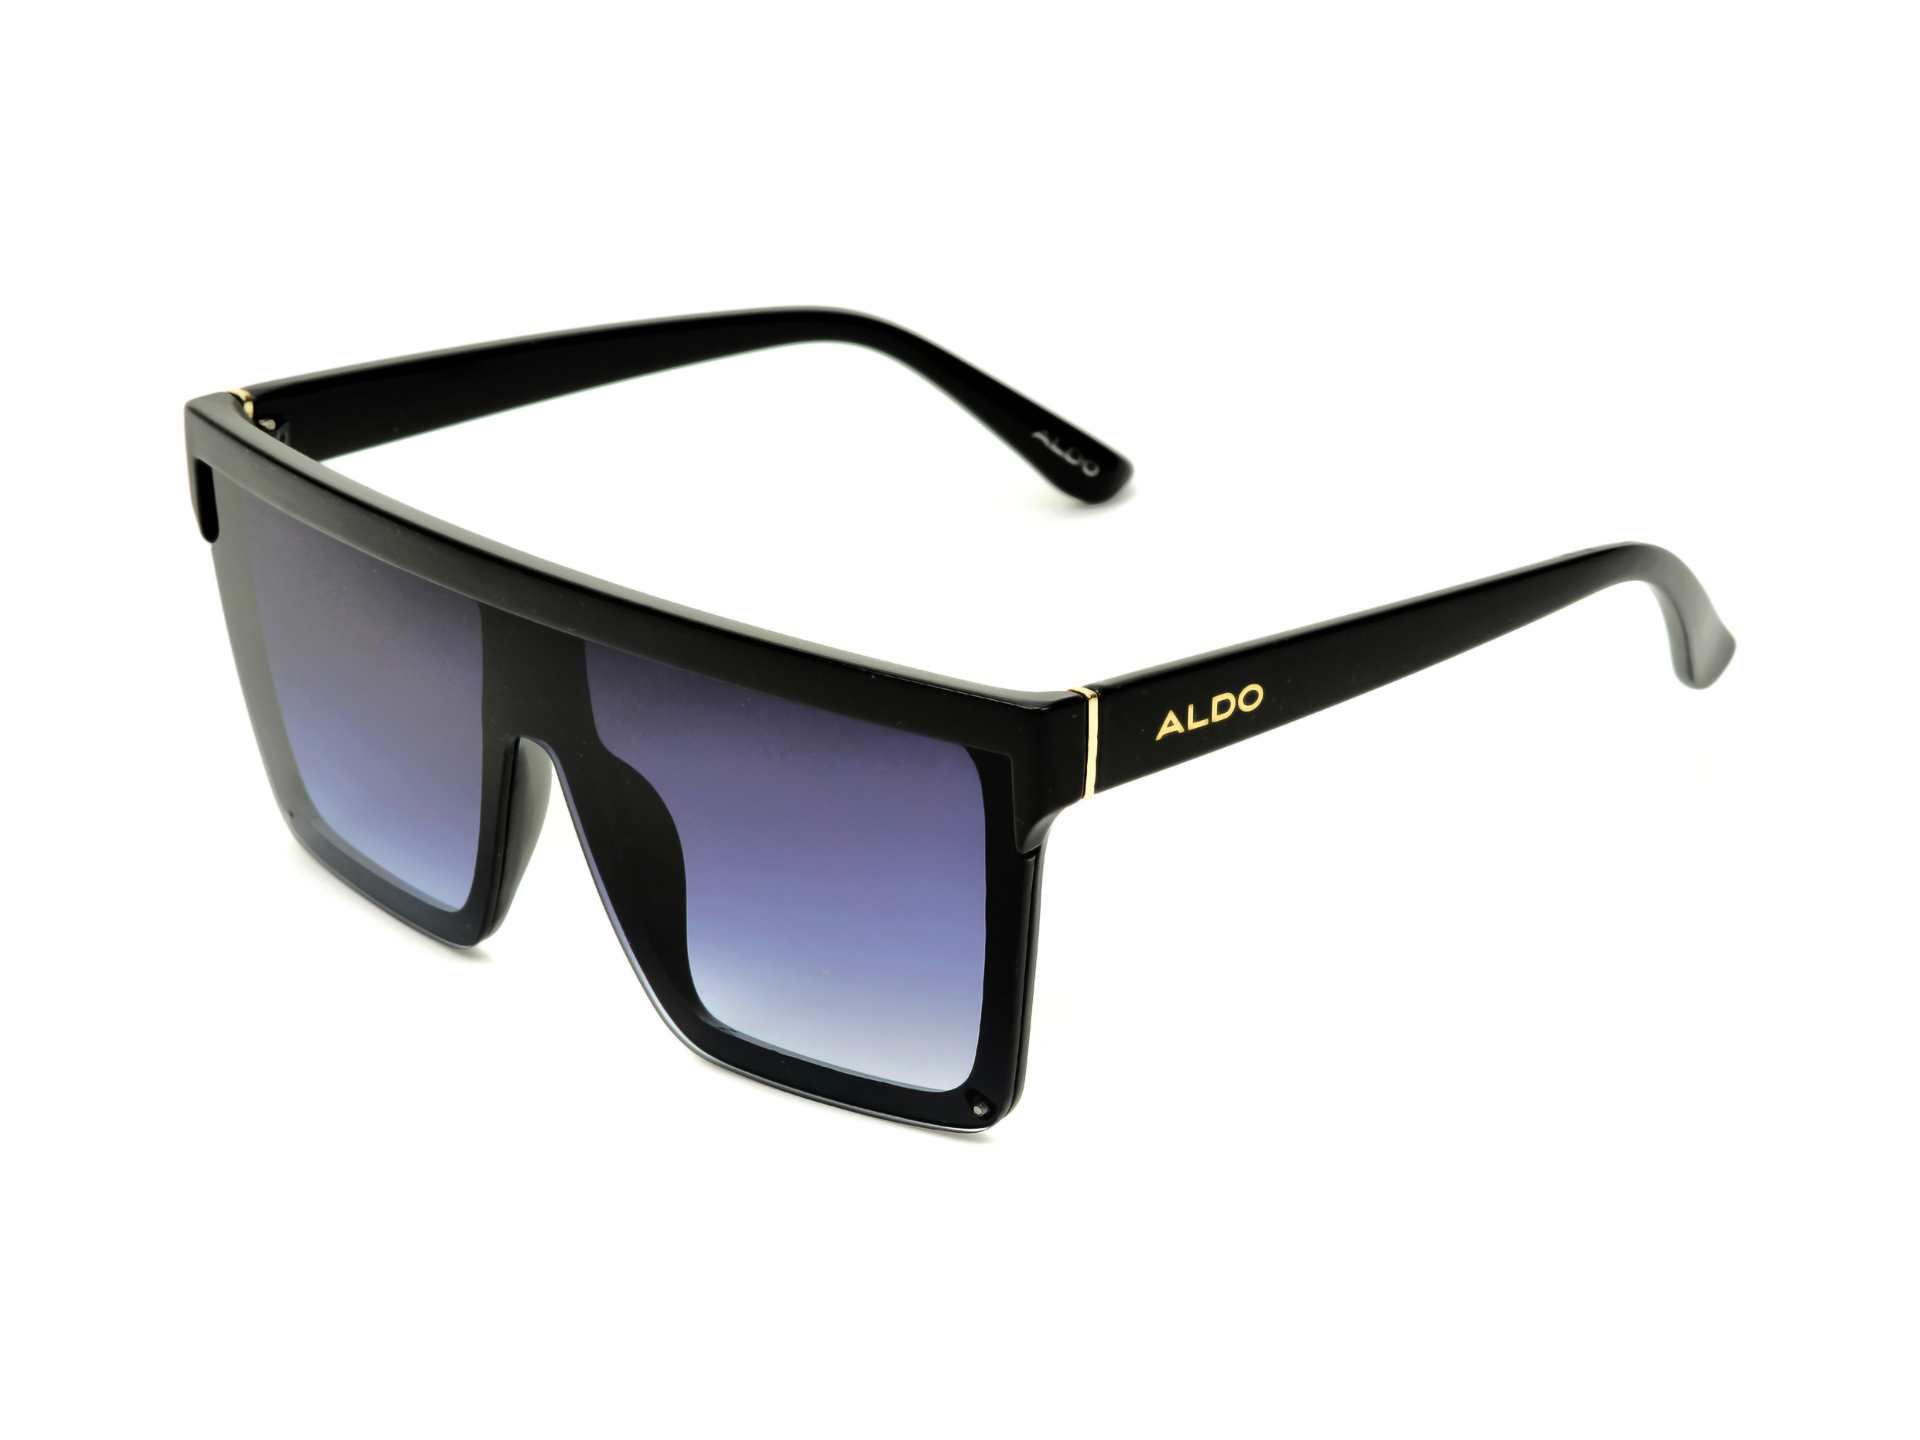 Ochelari de soare ALDO negri, Maronite001, din PVC imagine